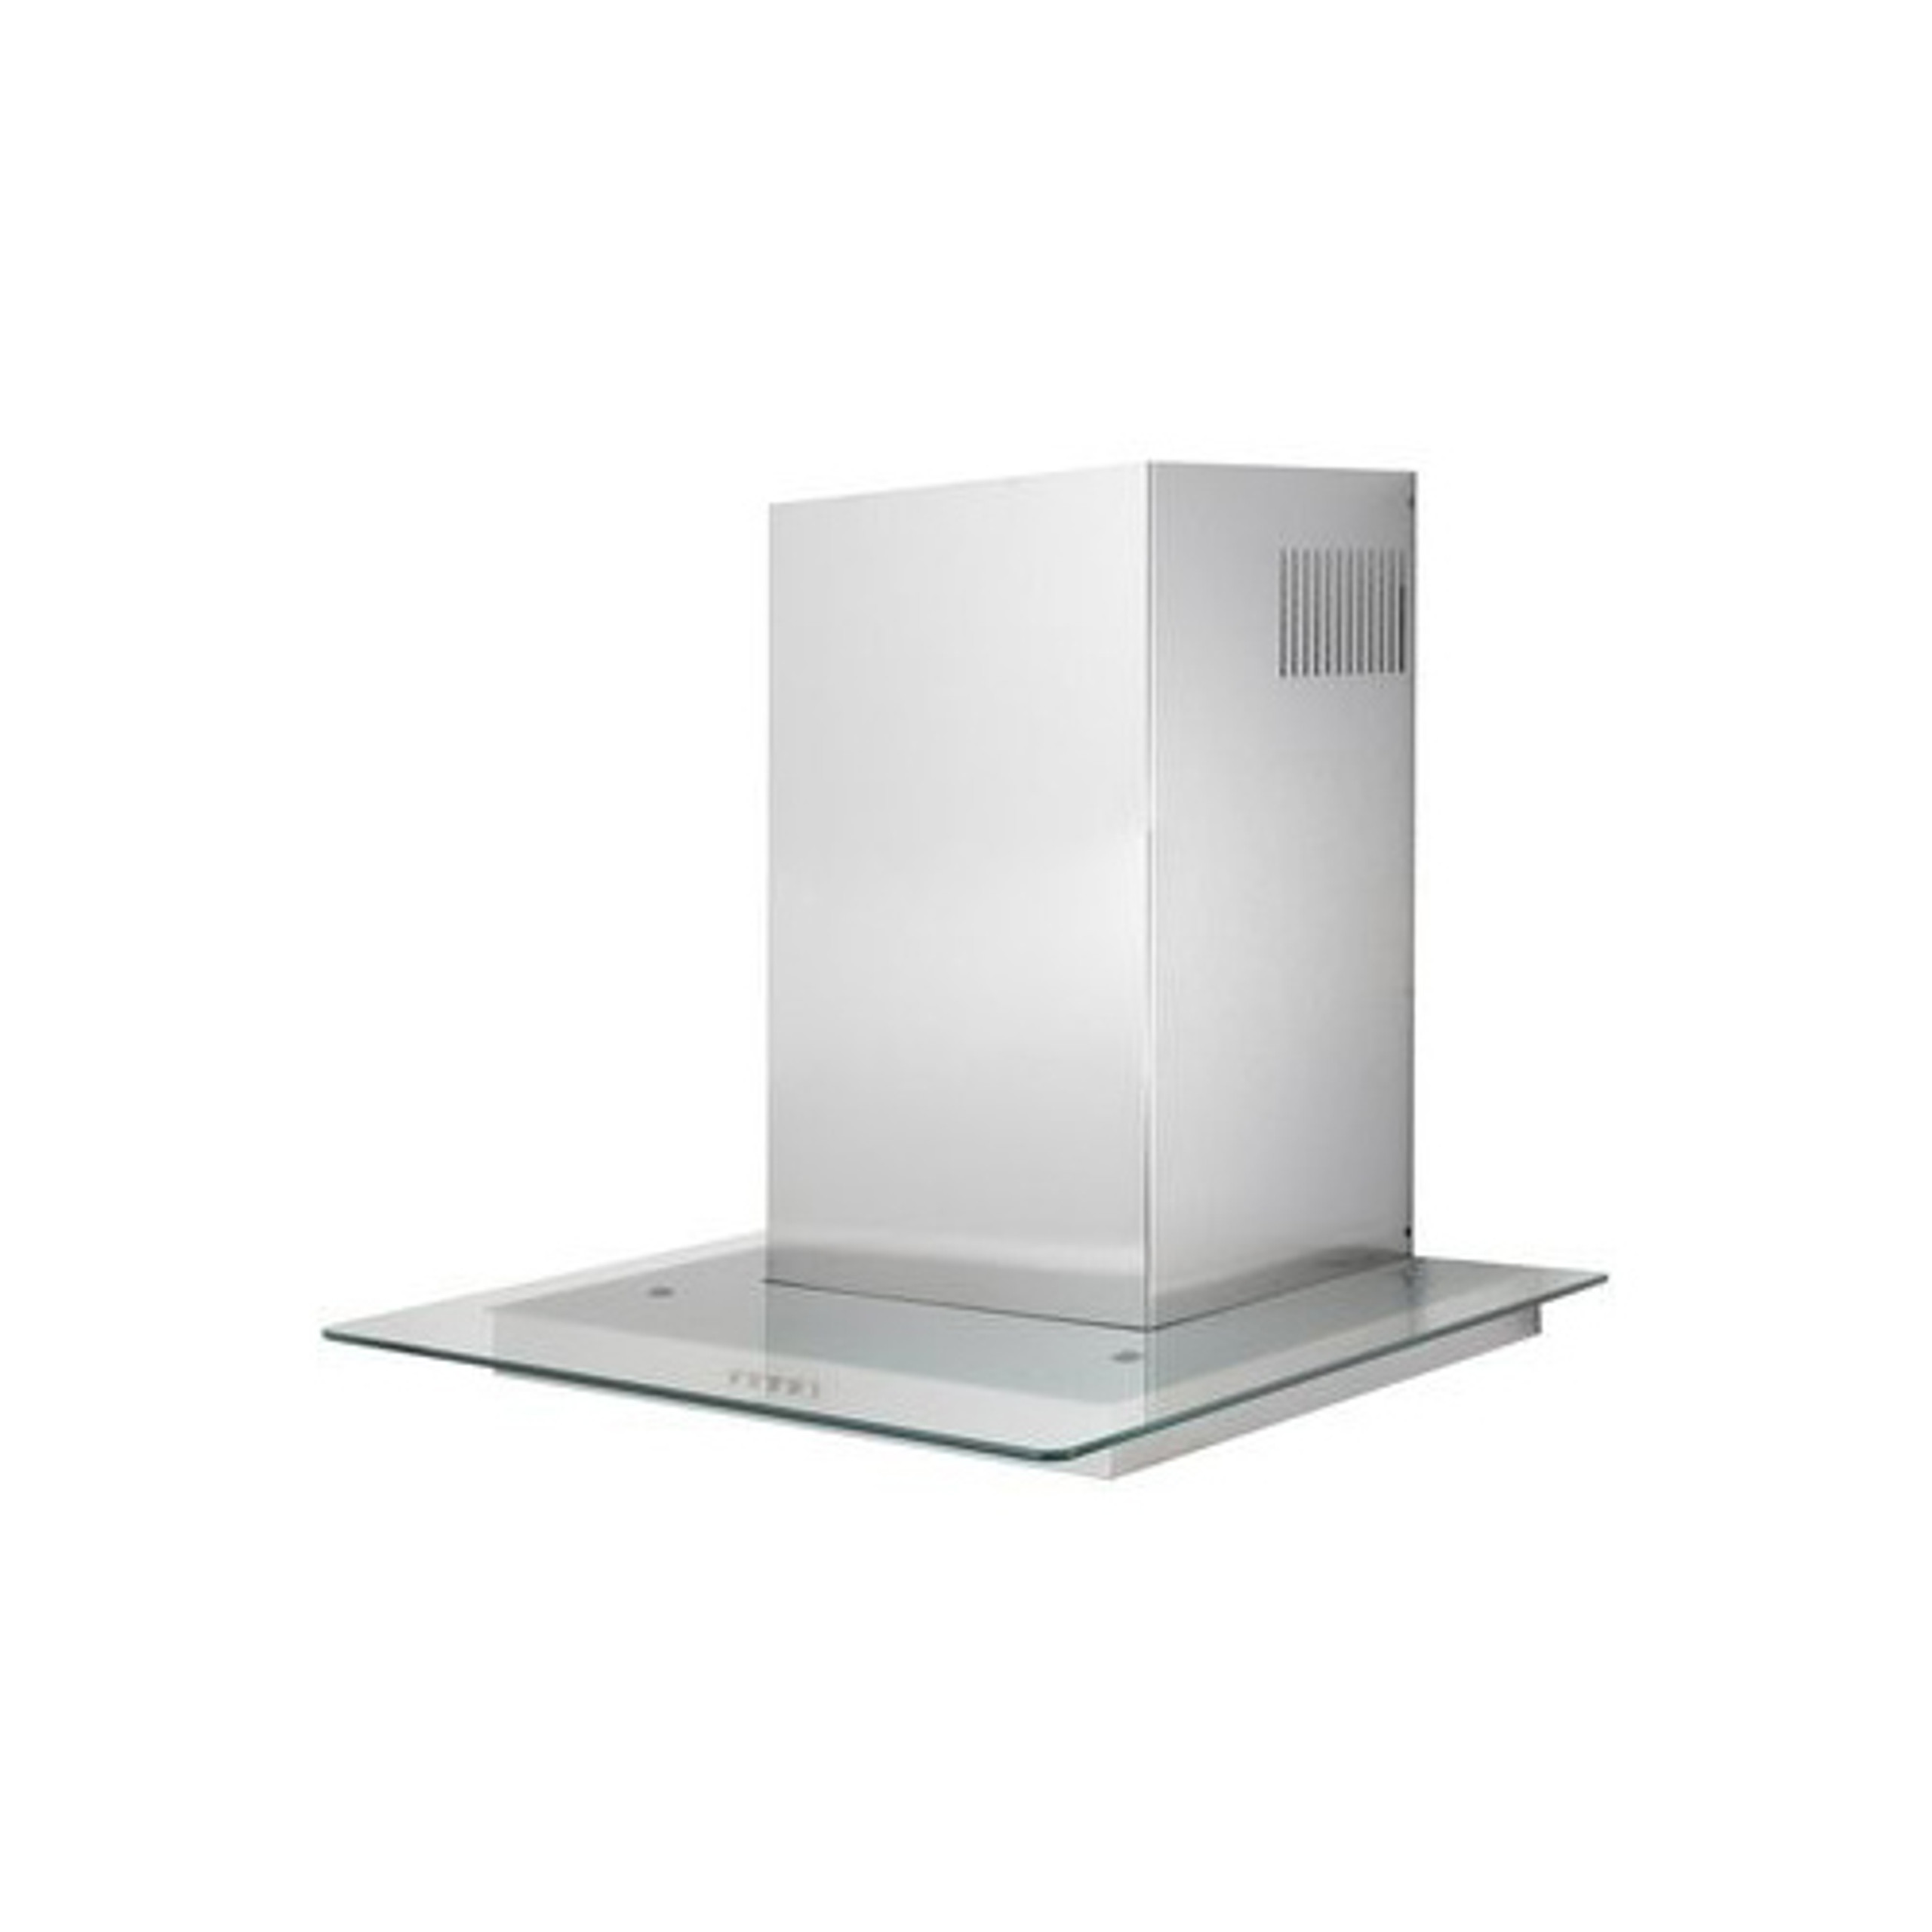 mebasa dunstabzugshaube cucina3000 edelstahl 60 cm k chen e ger te dunstabzugshauben. Black Bedroom Furniture Sets. Home Design Ideas